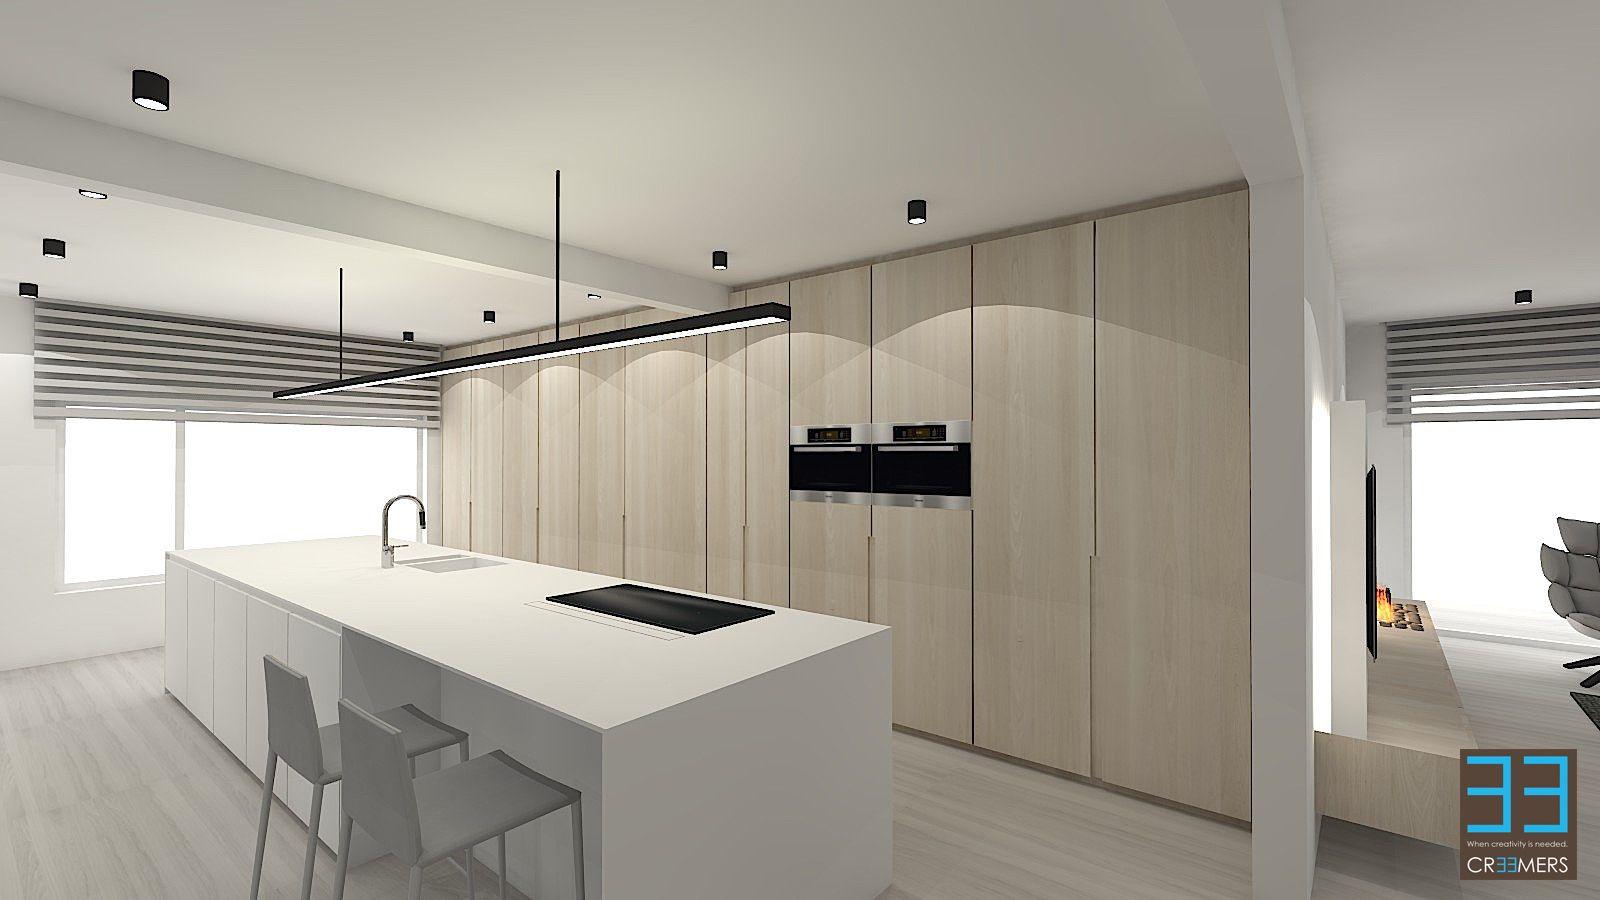 Moderne keuken met tablet in corian wit en eik fineer achterwand